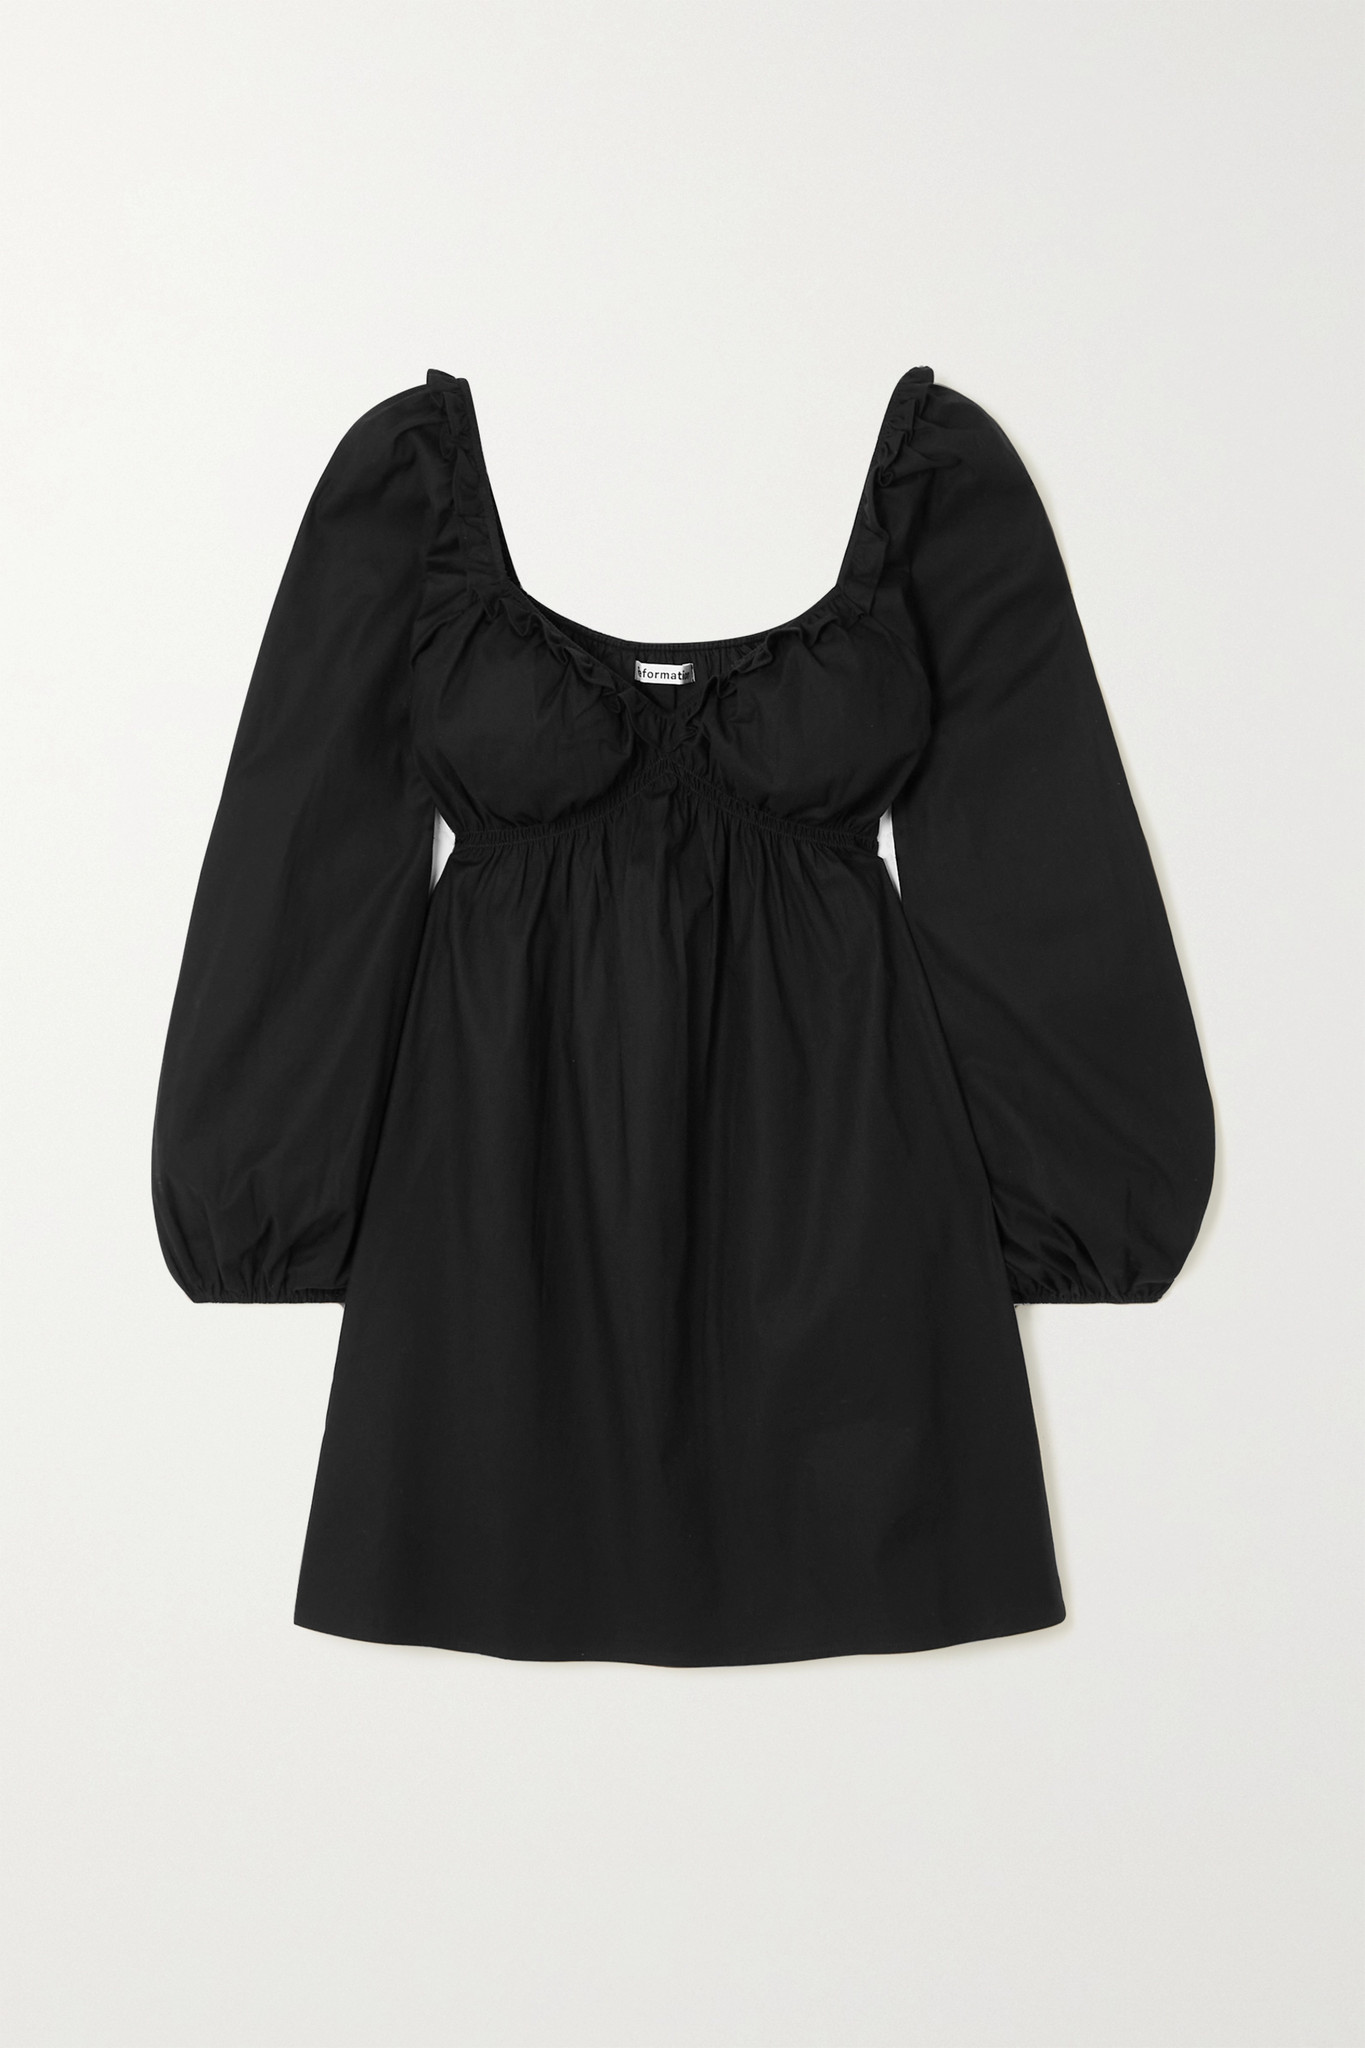 REFORMATION - 【net Sustain】vic 褶饰有机棉质混纺府绸迷你连衣裙 - 黑色 - x large